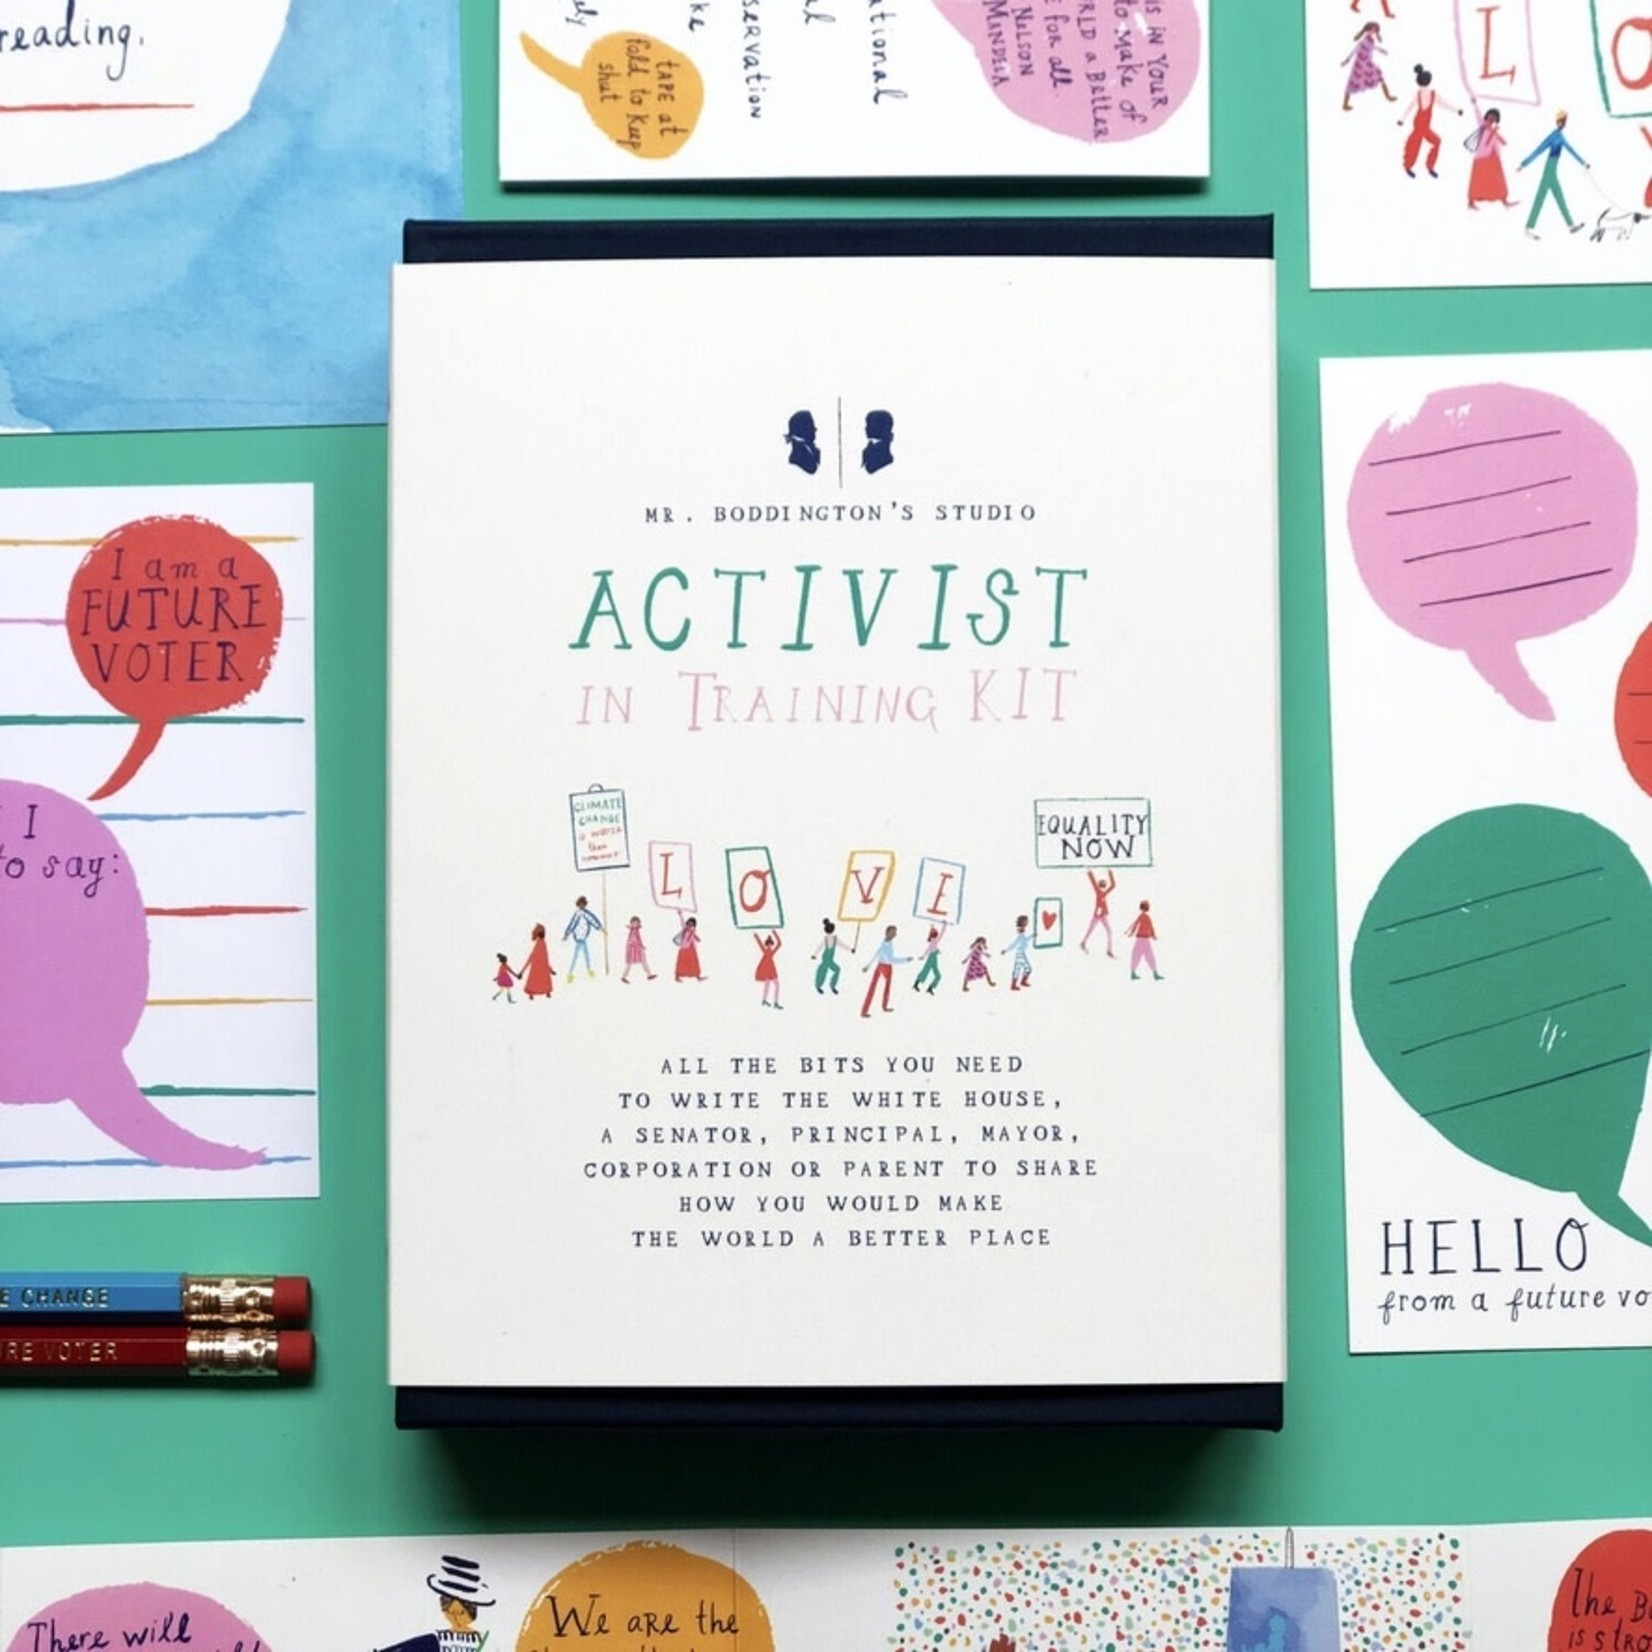 Mr. Boddington's Studio Activist Training Kit